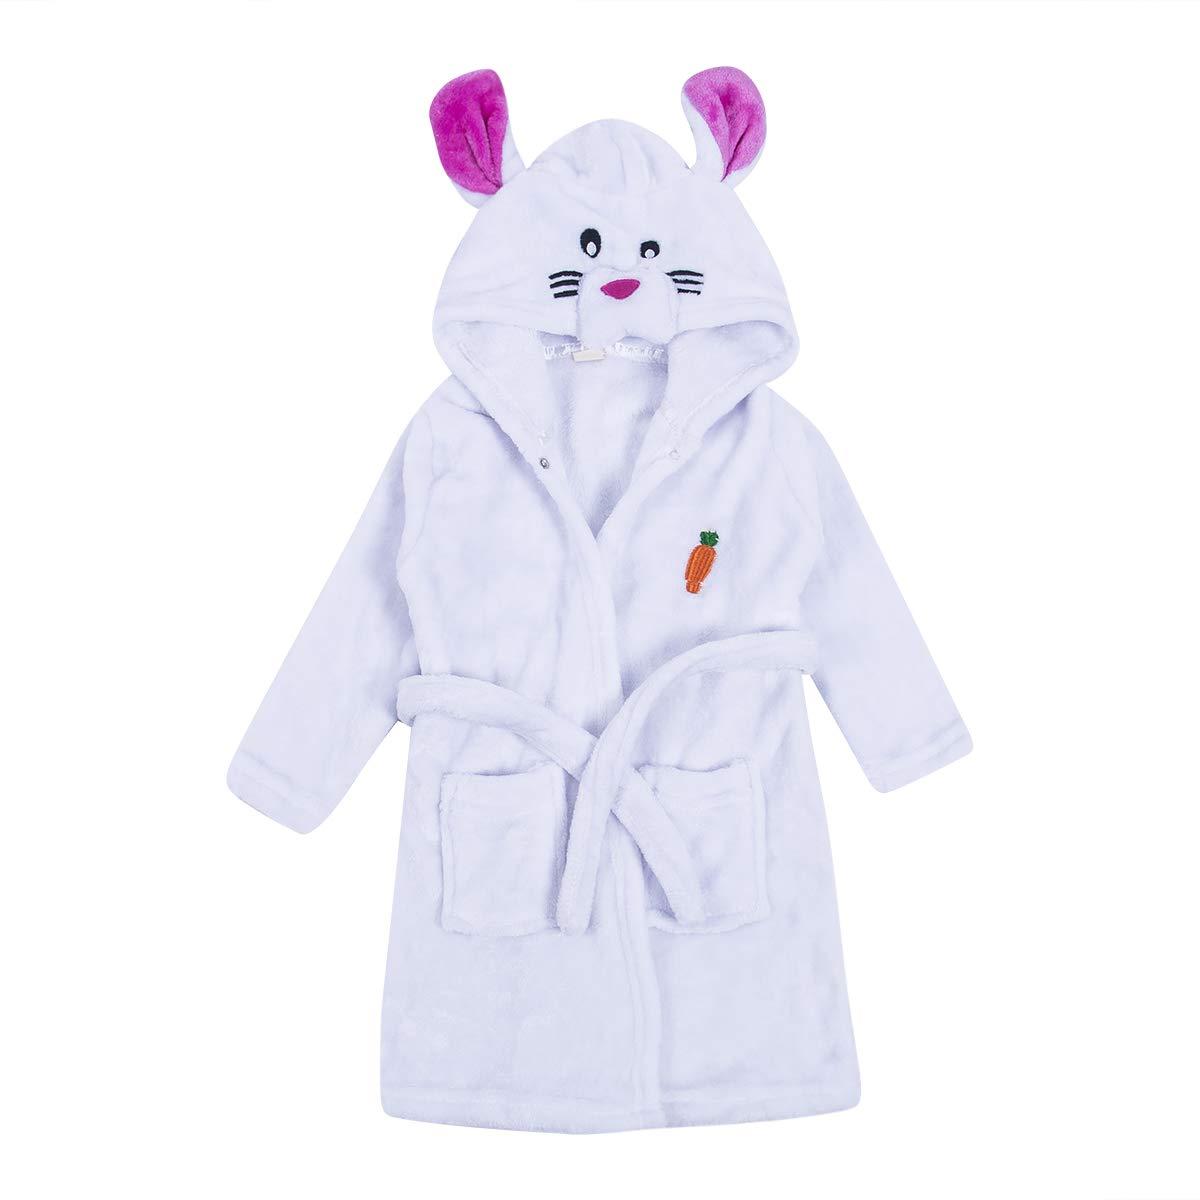 Baby Bathrobe Animals Hooded Kids Toddler Boy Girl Long Sleeve Flannel Hoodies Pajamas Sleepwear 1-8T